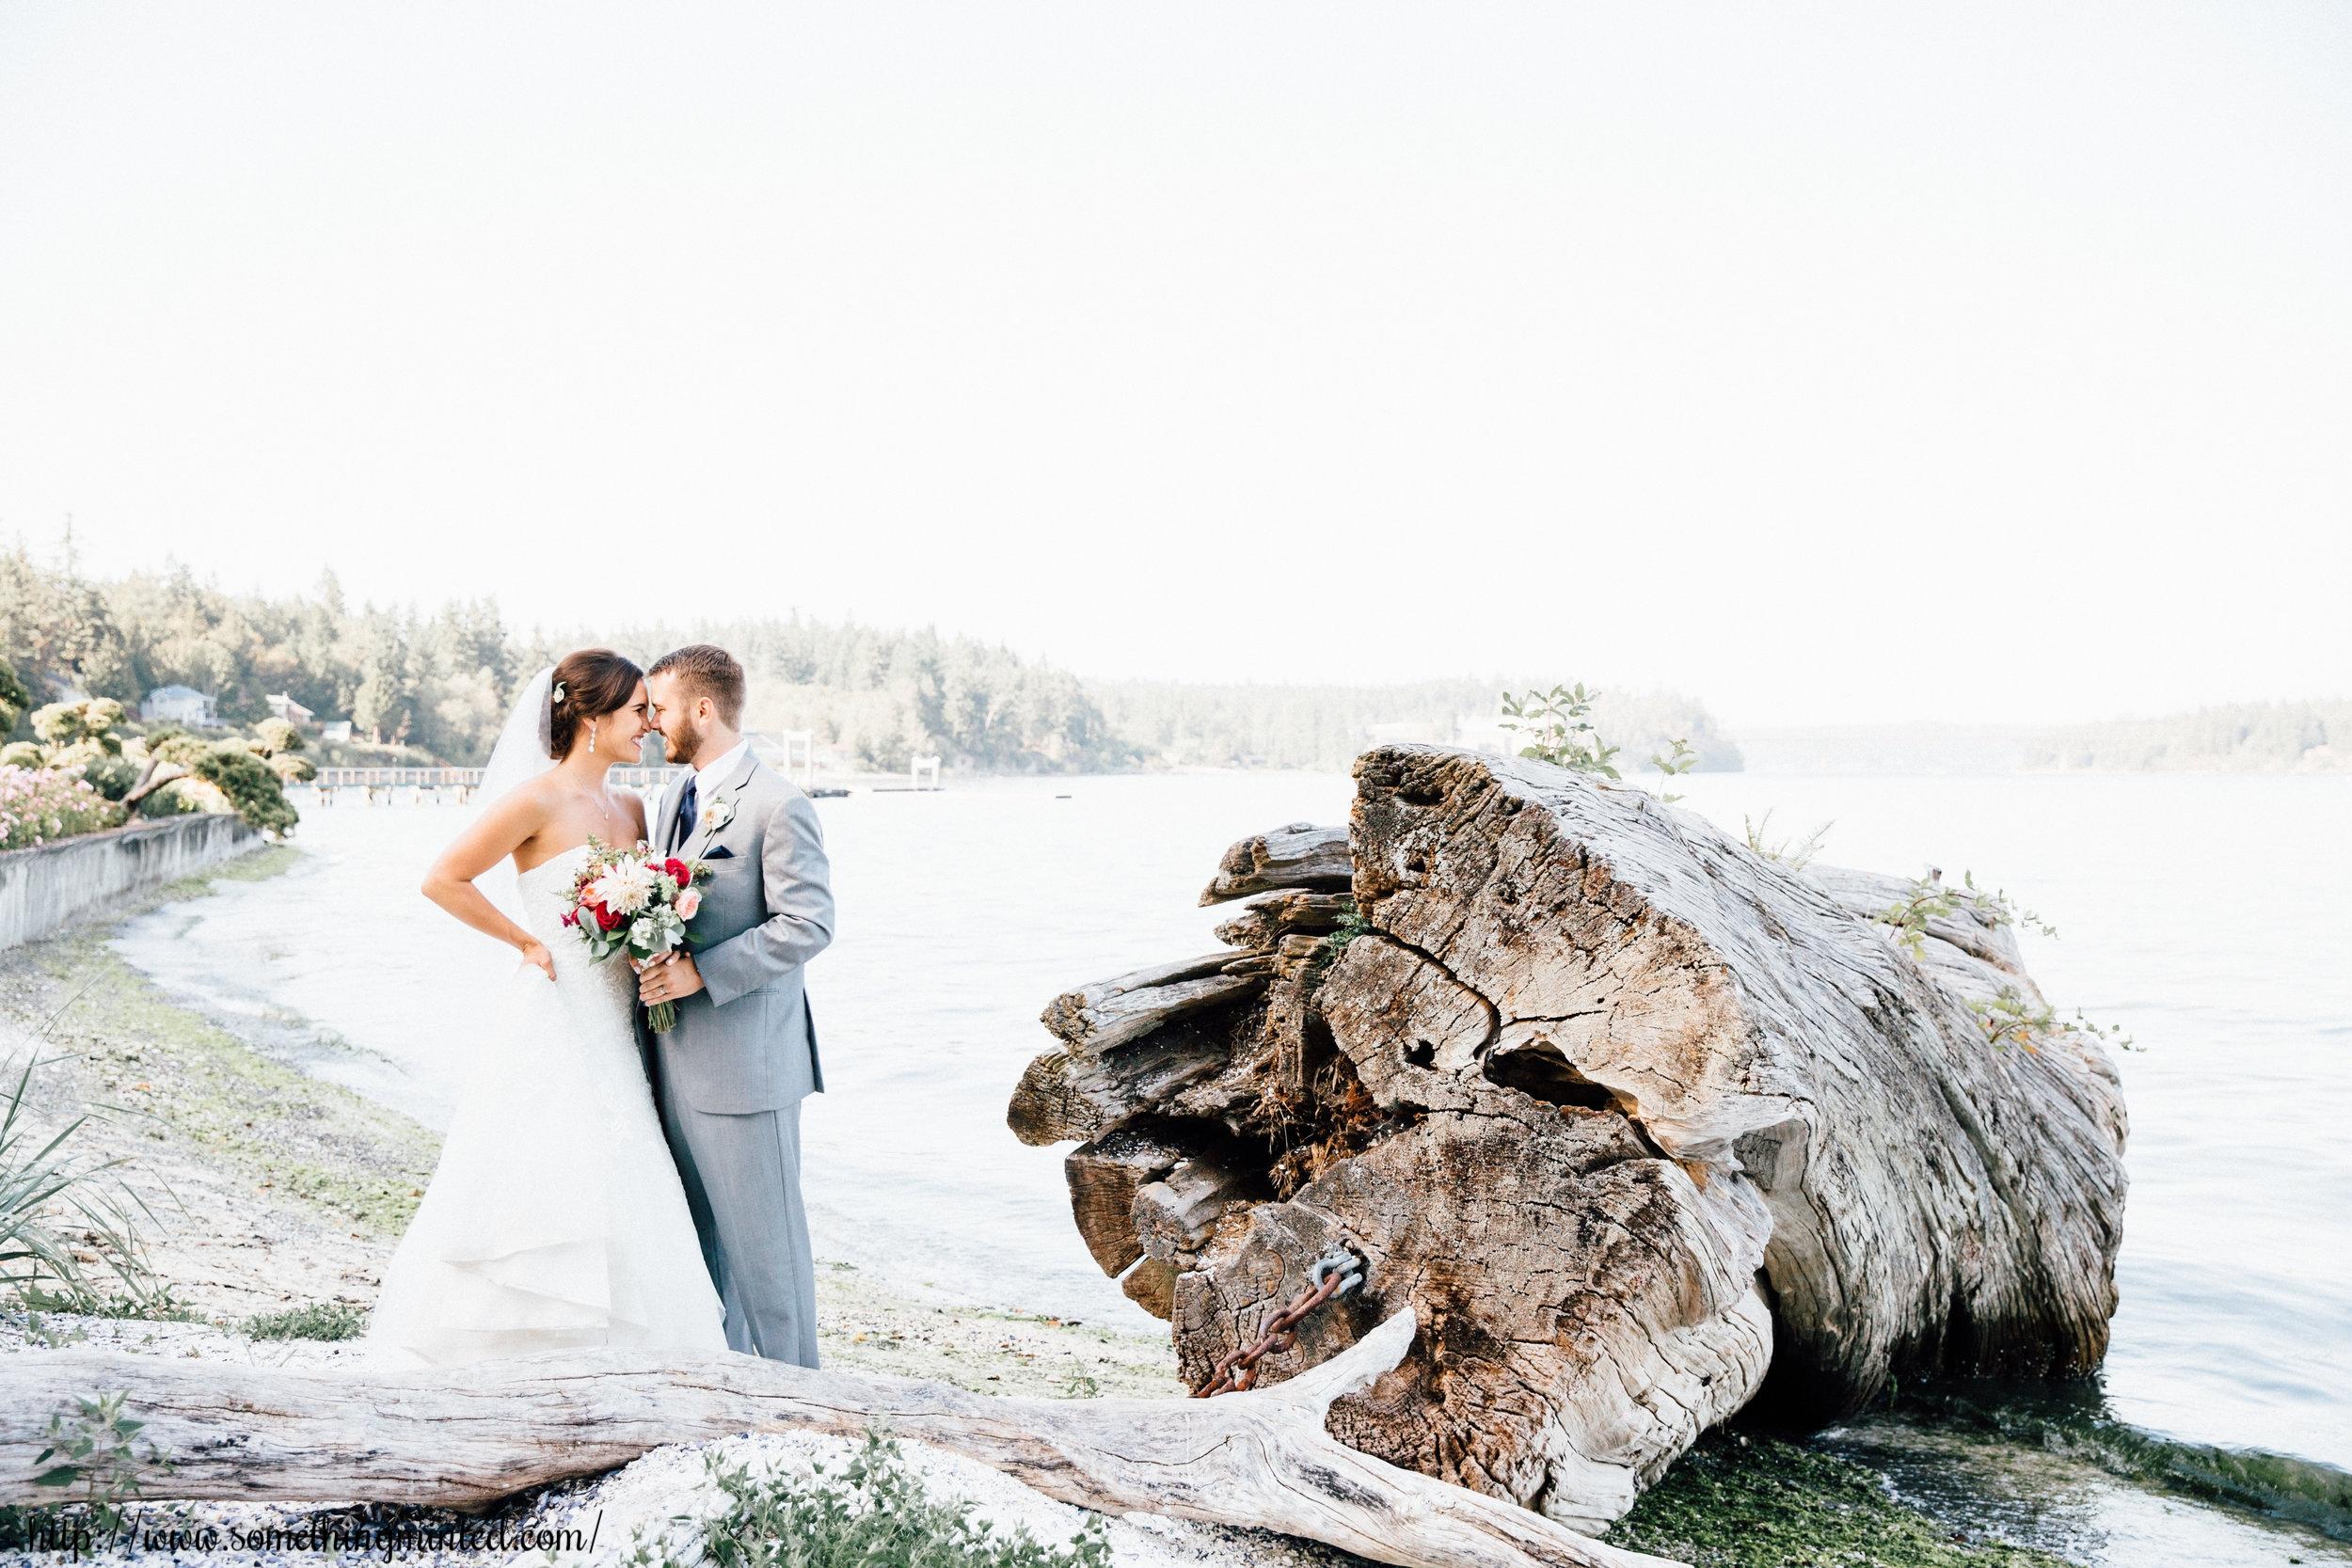 Kiana Lodge Wedding - Seattle Wedding Photographer - Something Minted Photography-300 (1).jpg